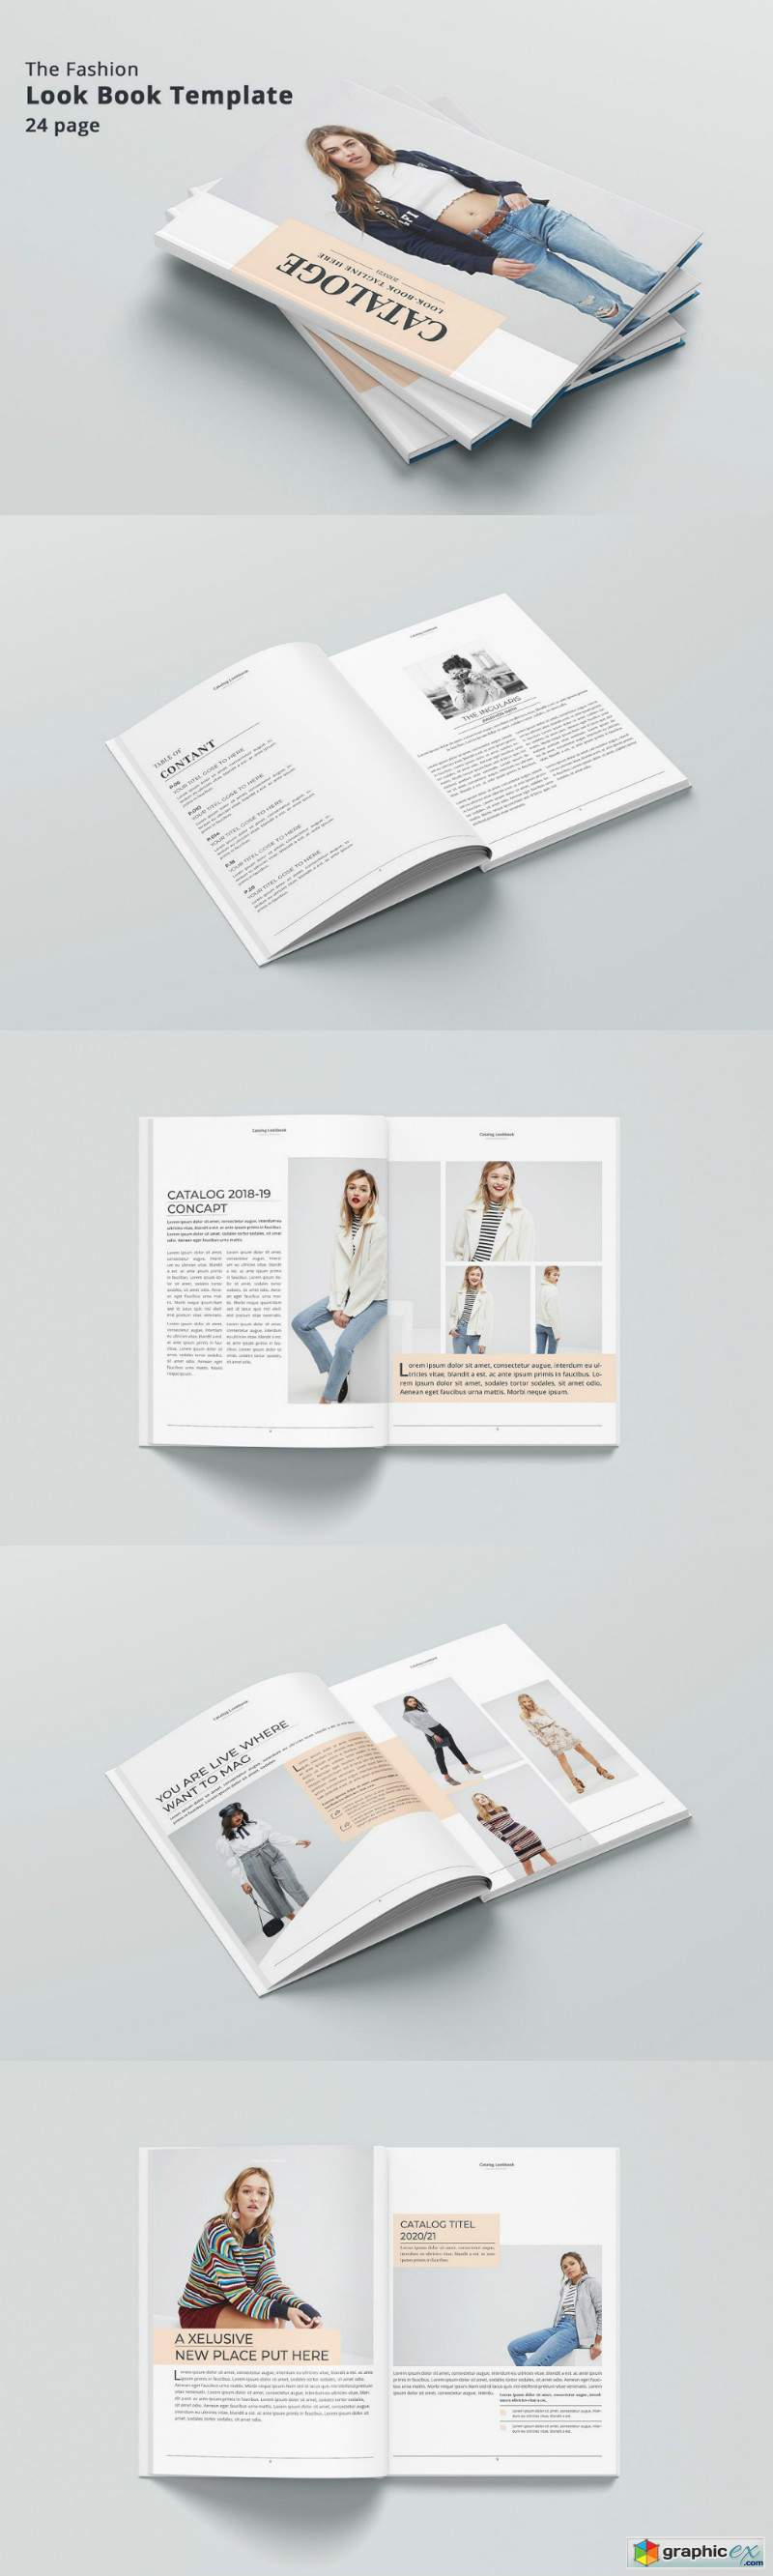 Fashion Catalog Lookbook » Free Download Vector Stock Image